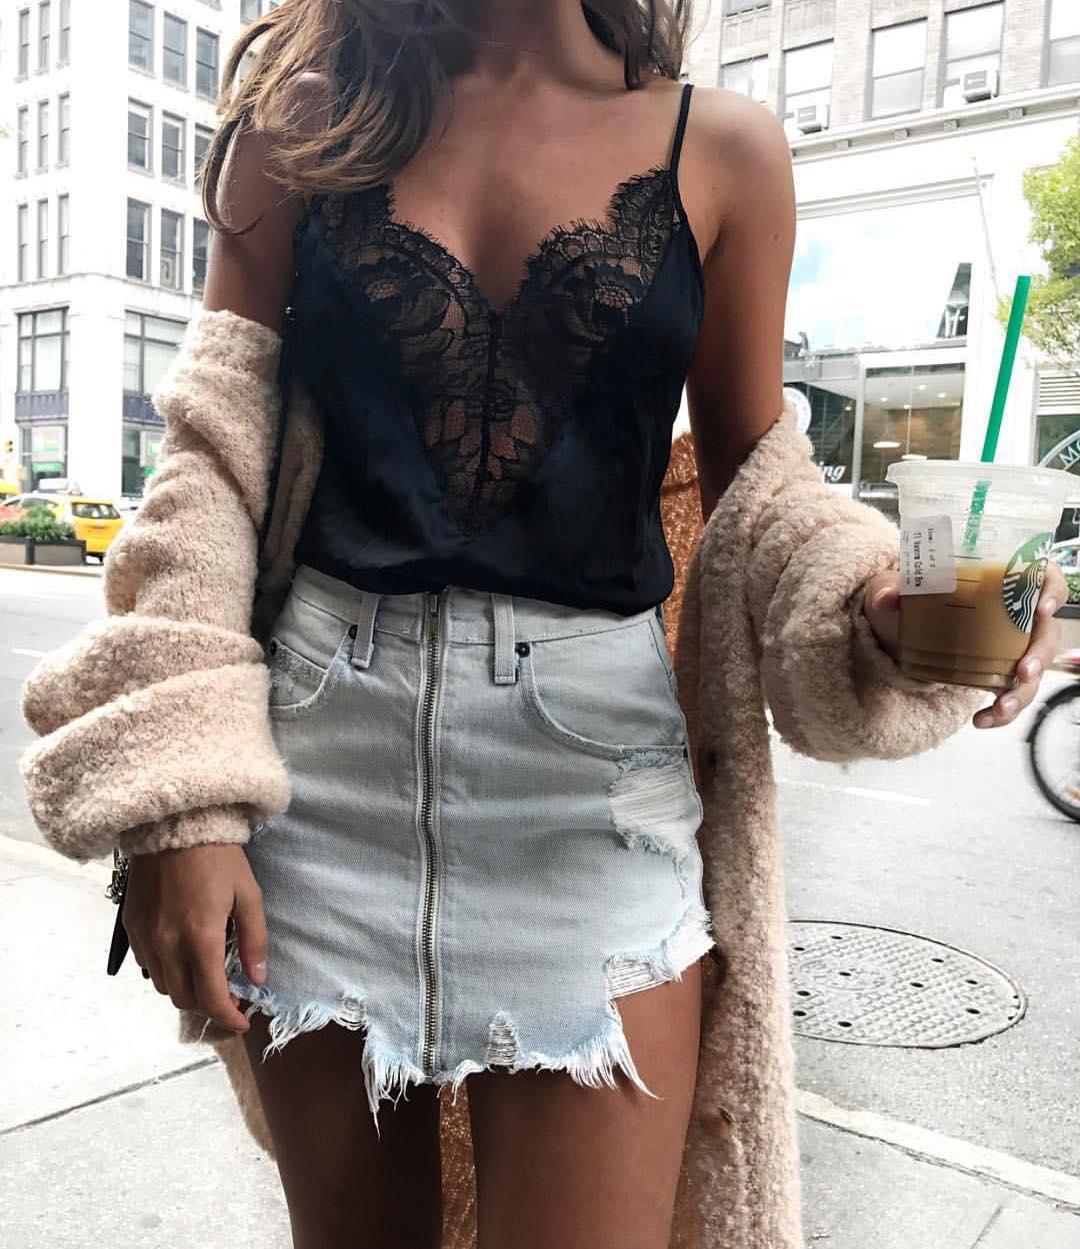 18 Women Sexy Lace Vest Blouse Deep V Neck Blouse Summer Fashion Sleeveless Shirt Female Backless Tops 6